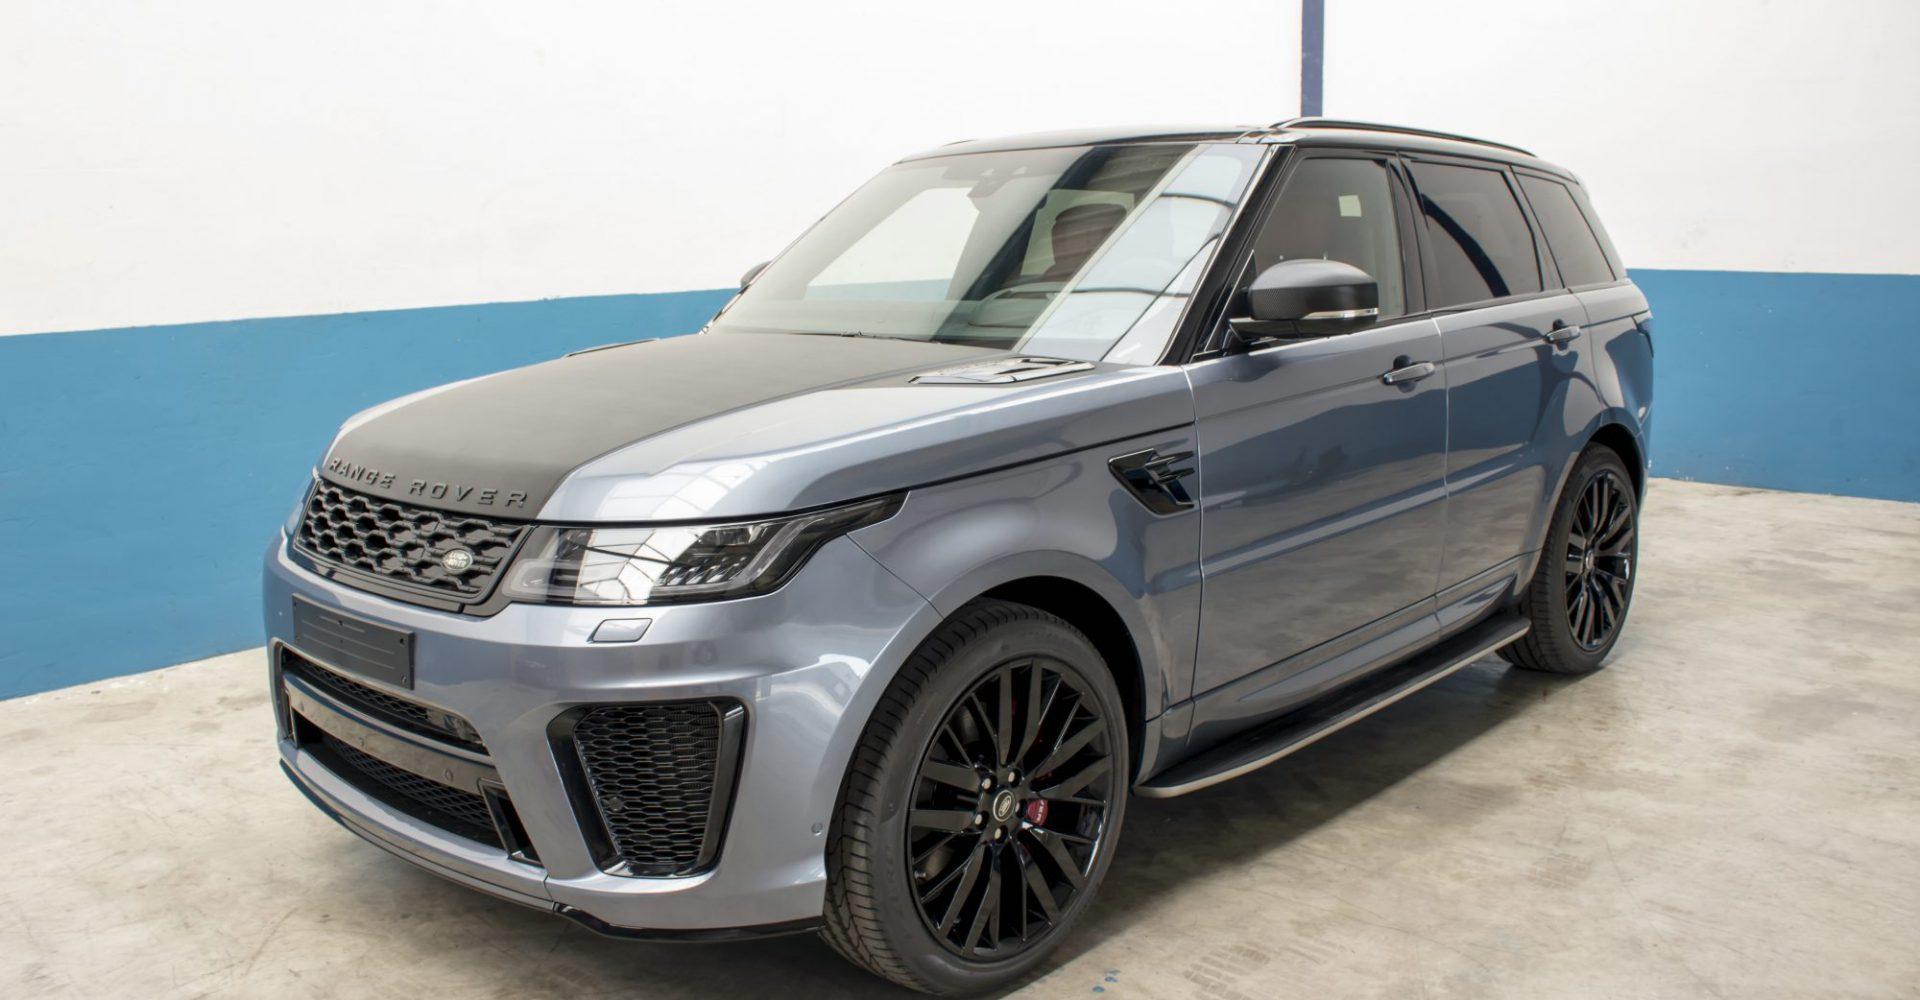 Range Rover Sport - SVR Bodykit | TLM lease